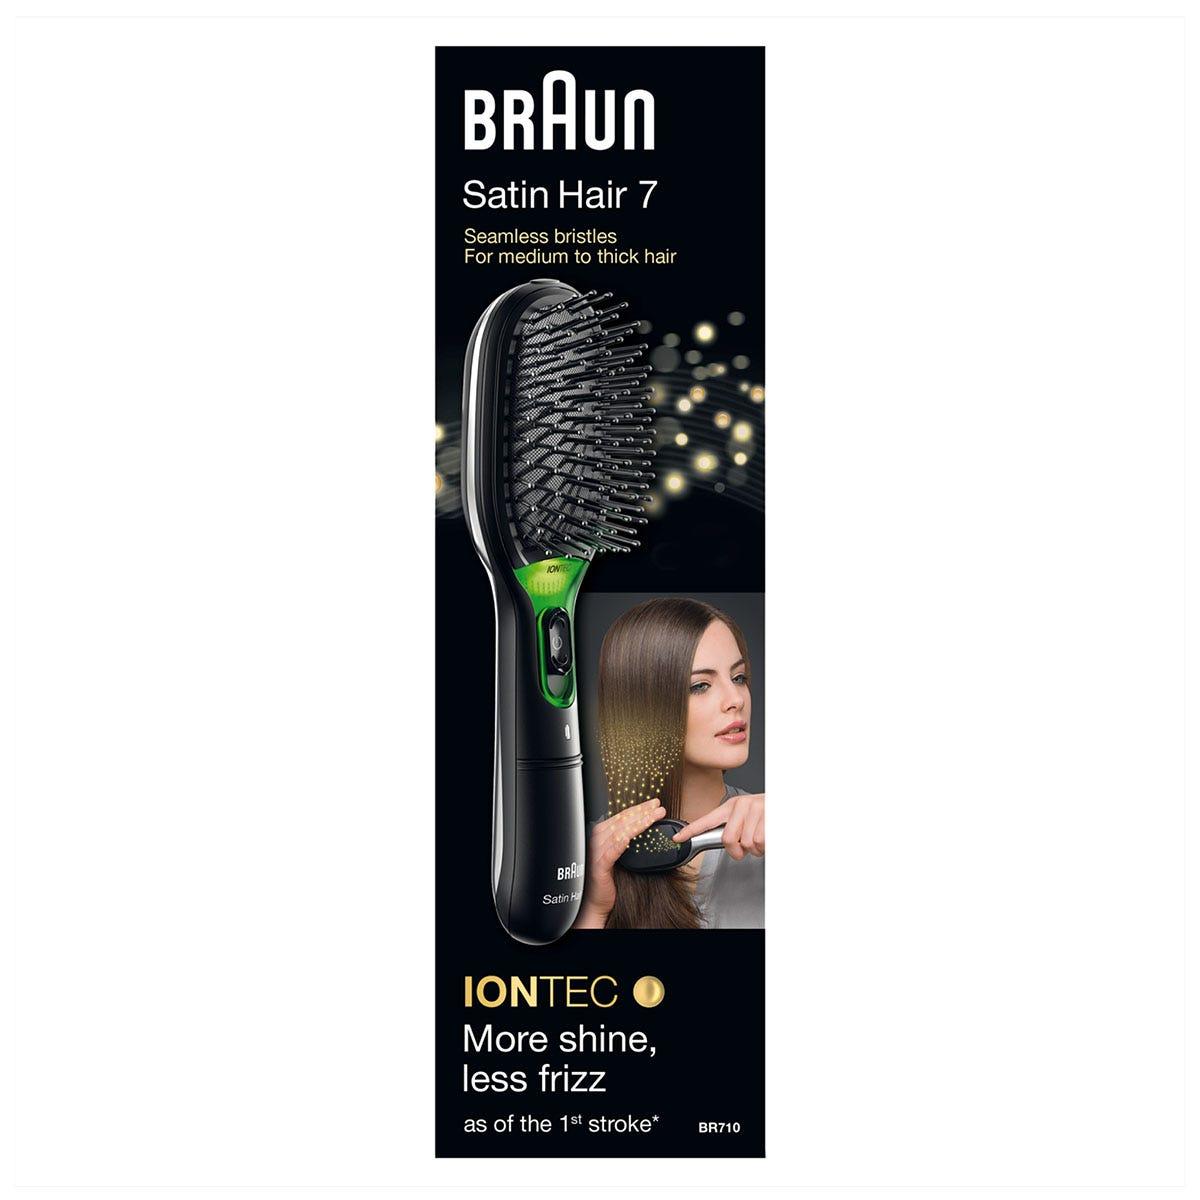 Braun BRABR710 Satin Hair 7 IONTEC Brush - Black